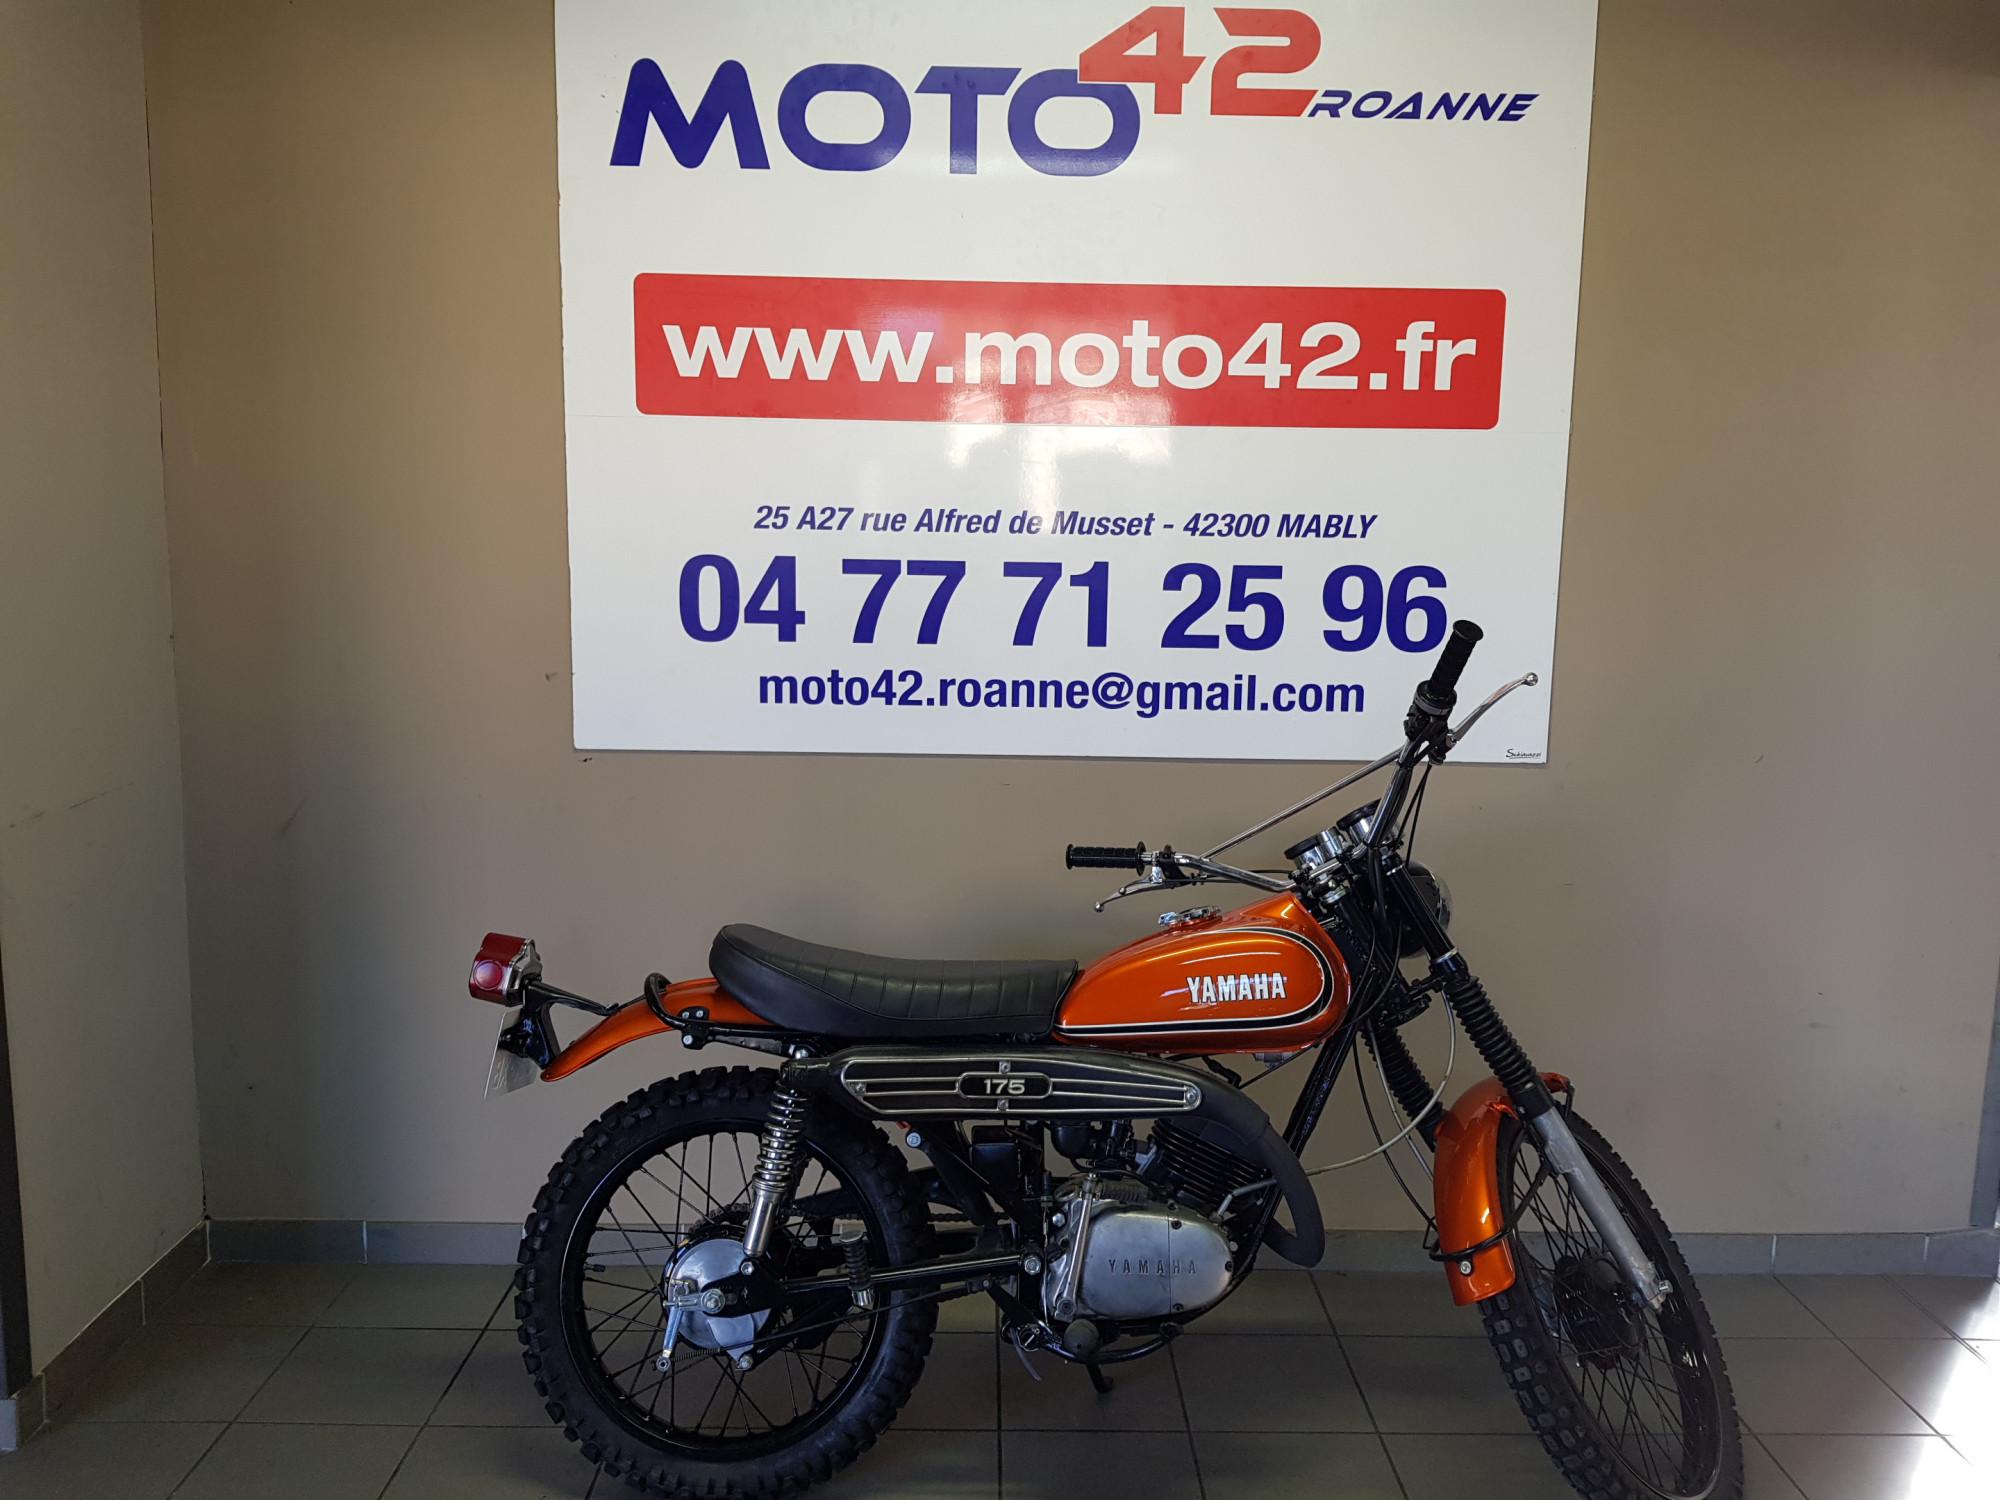 Annonce moto Yamaha CT 175